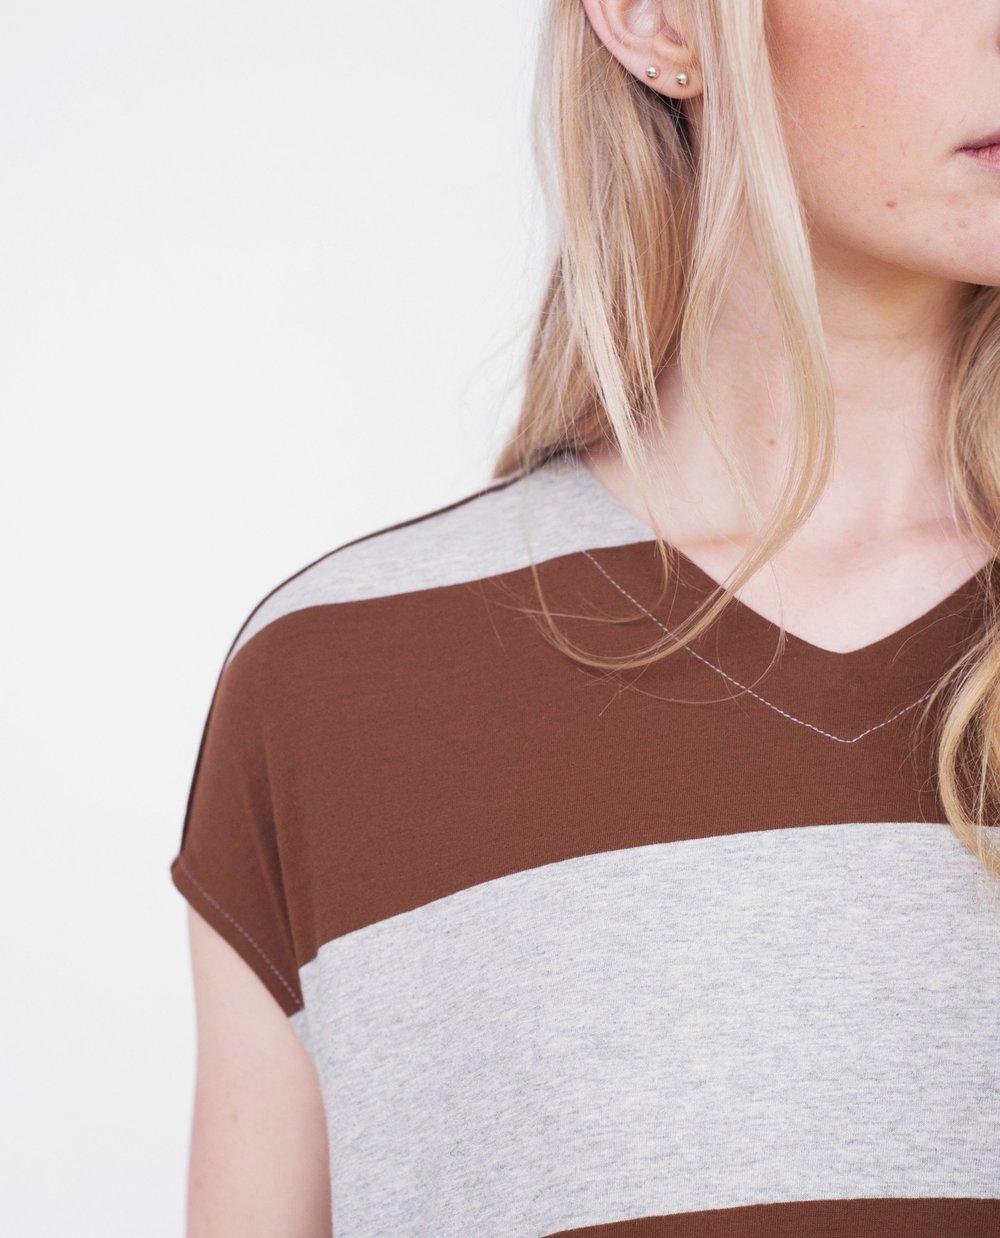 Aubrey-Beaumont-Organic-Organic-Cotton-Dress-In-Light-Grey-And-Brown-5.jpg